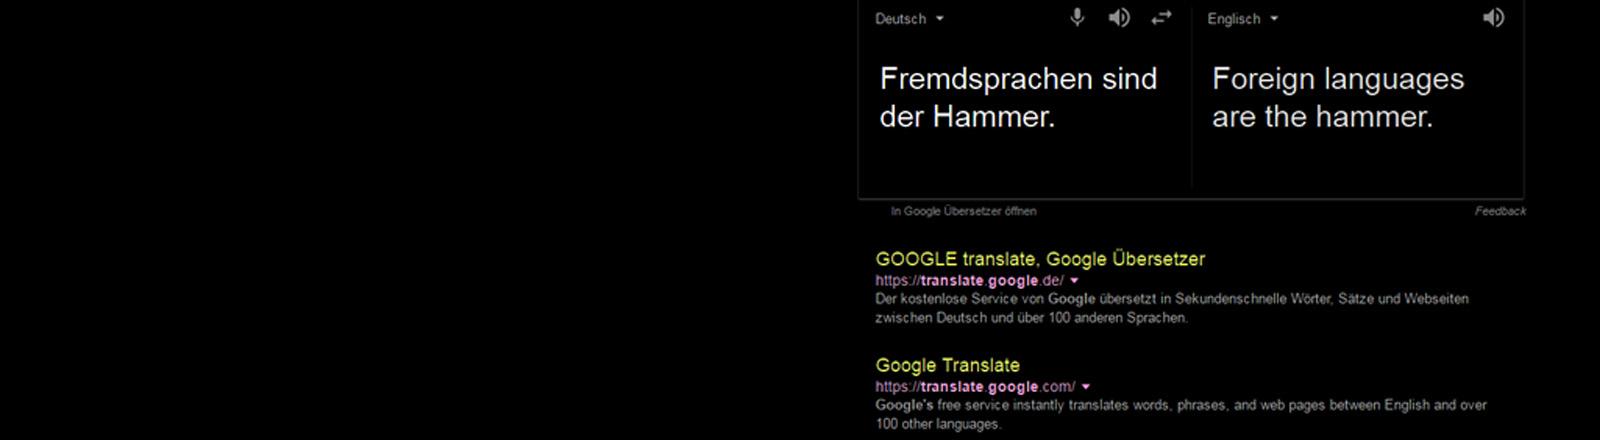 Screenshot von Google Translate